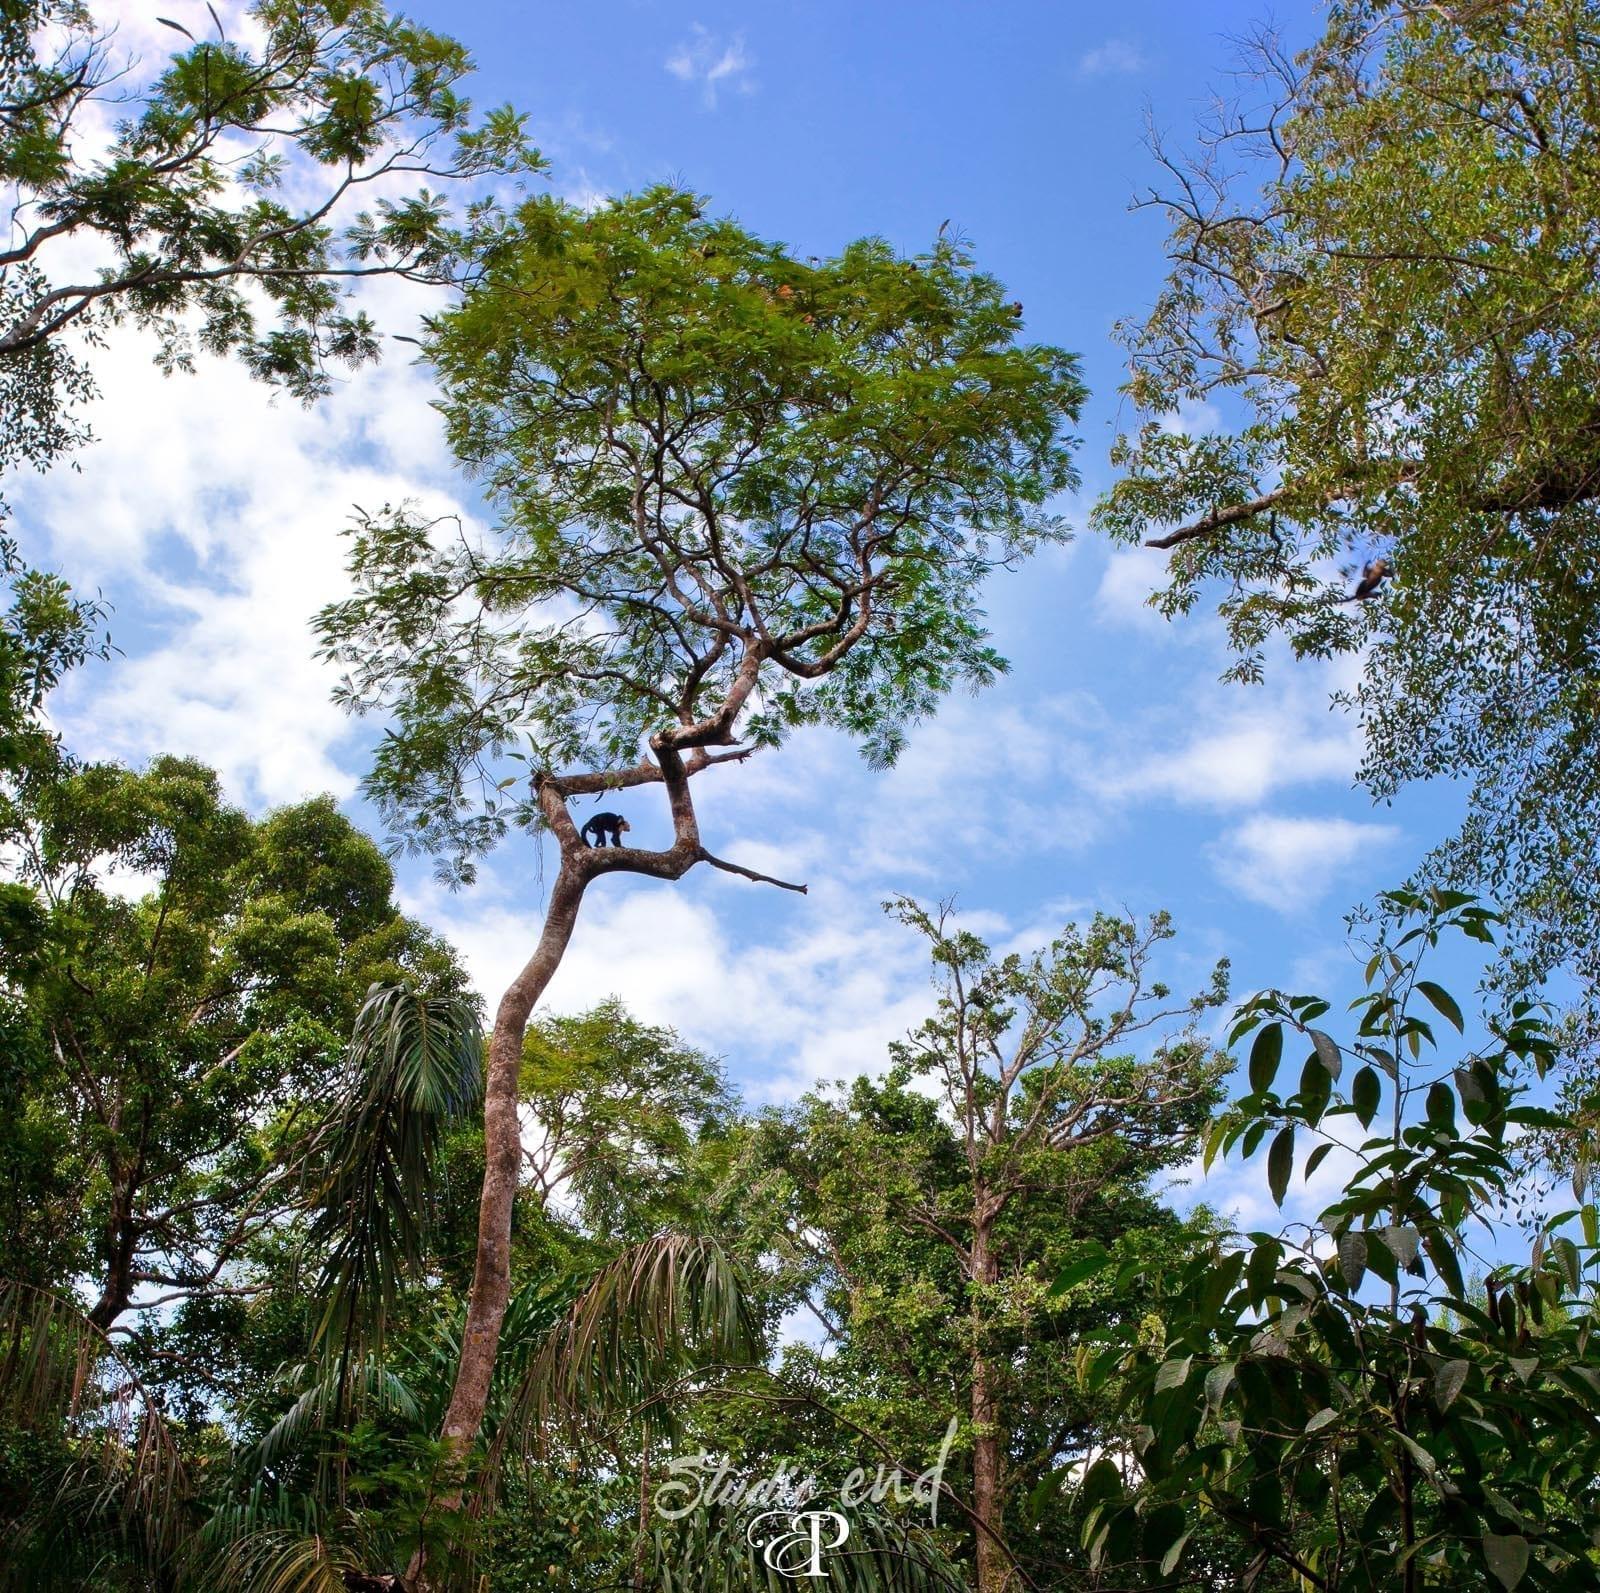 Photographe et reportage de voyage jungle Costa Rica Nicolas Delsaut